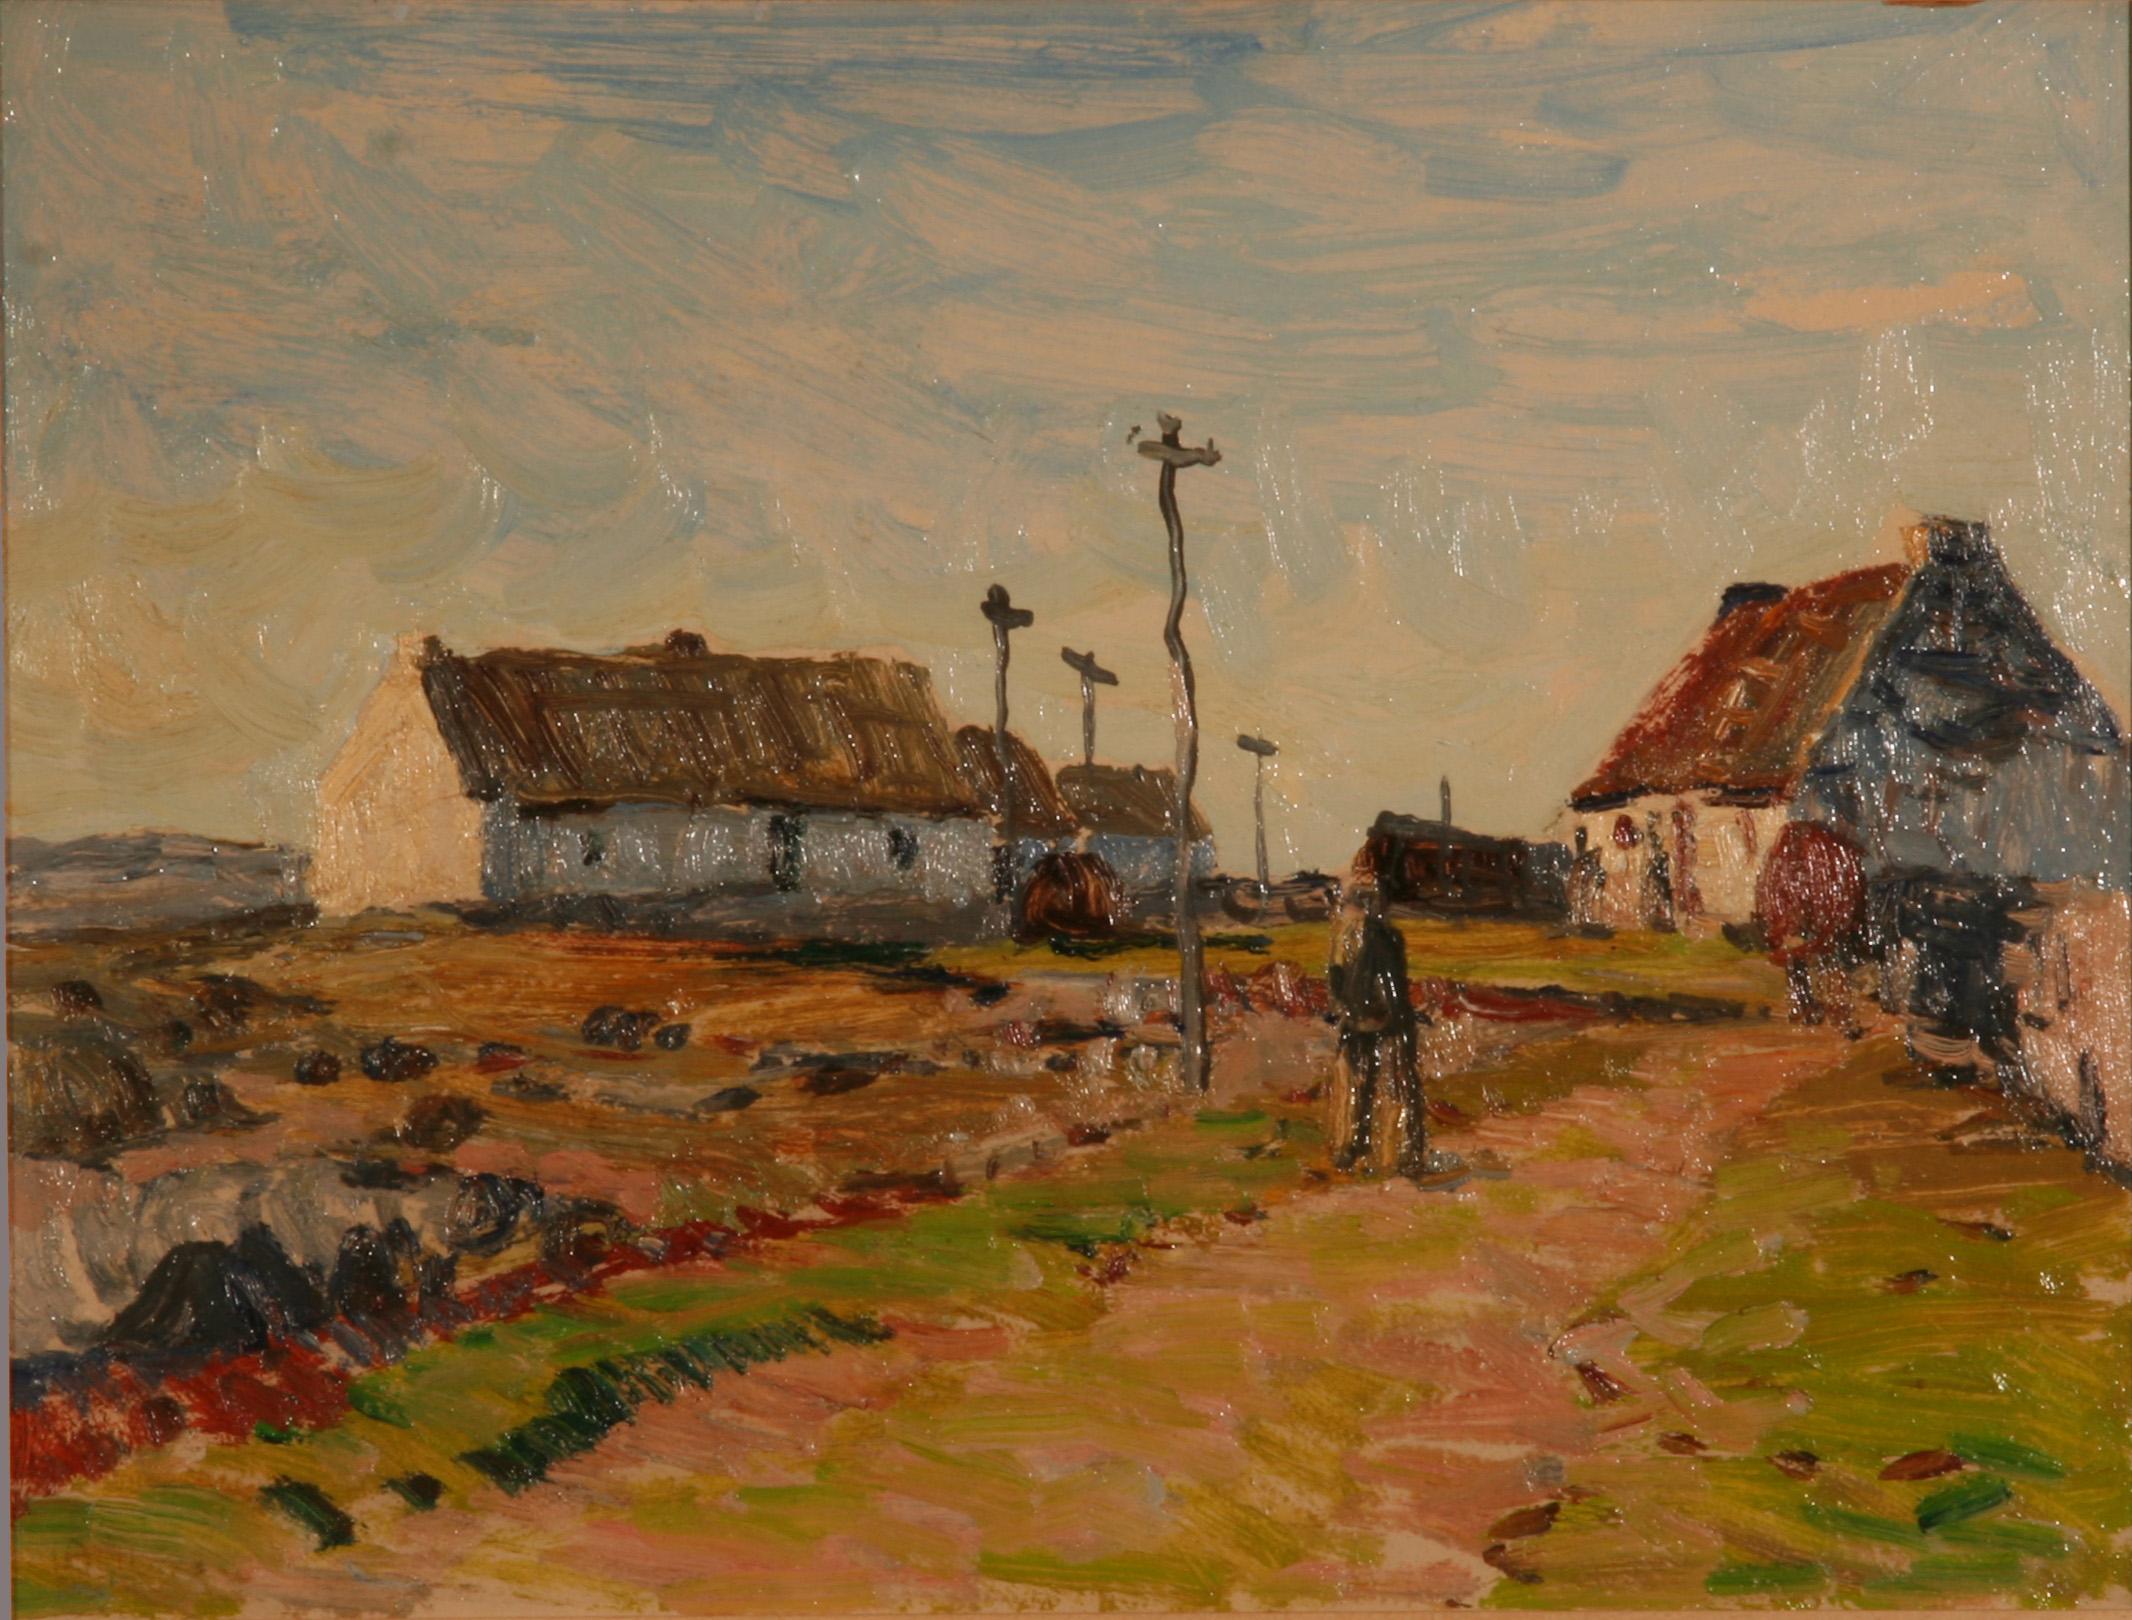 Charles Lamb painter